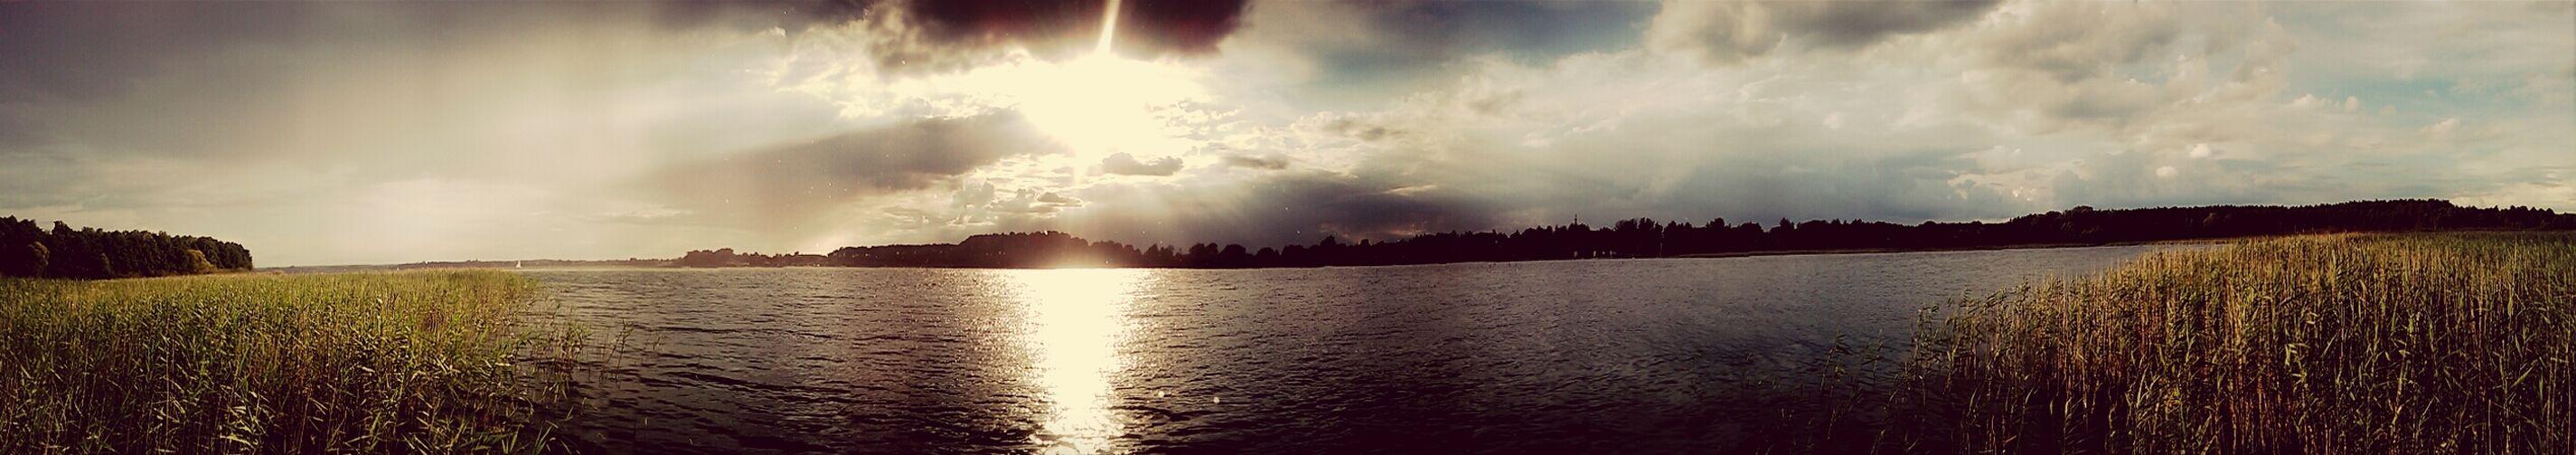 Powidz Jezioro_powidzkie Lake Lake View Landscape Poland Powidzkie_lake 🏊